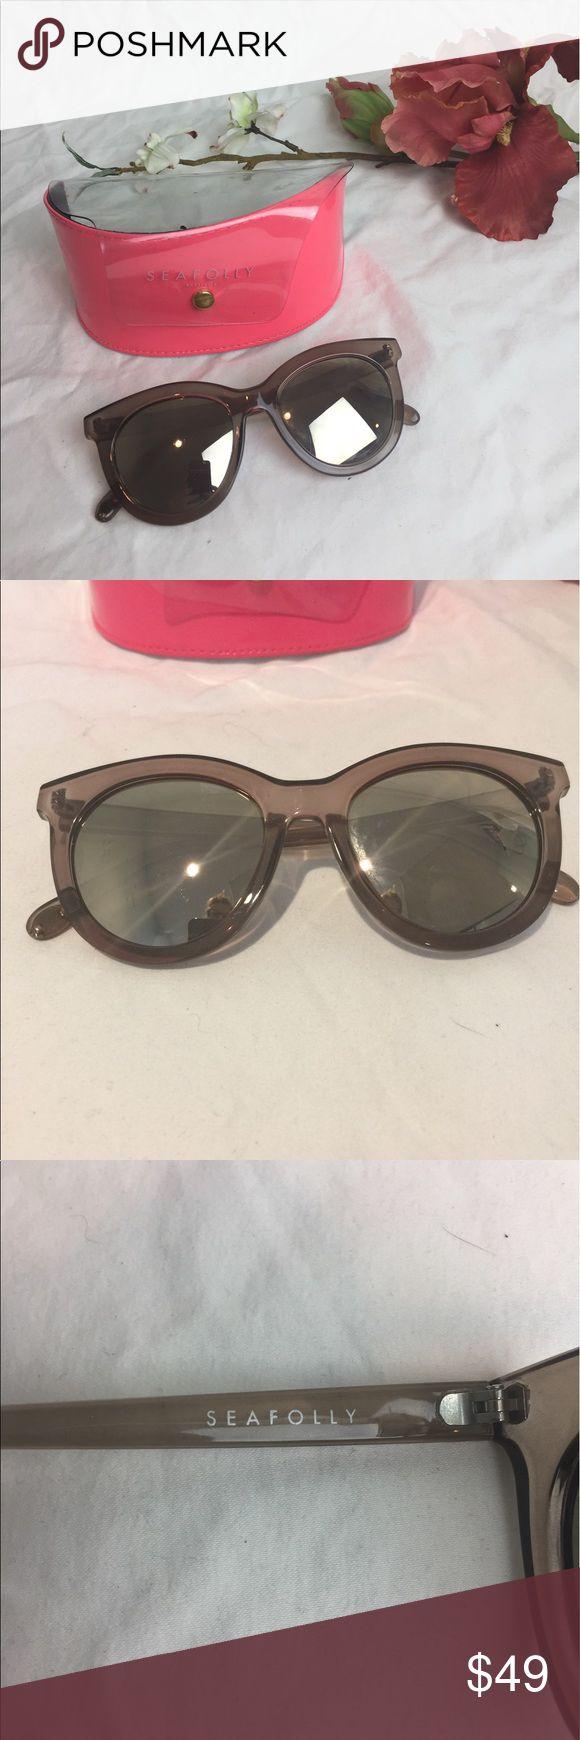 Seafolly Australian Iconic Sunglasses 😎 Iconic  Australian mirror sunglasses, no scratches, case included, rare style Seafolly Accessories Sunglasses